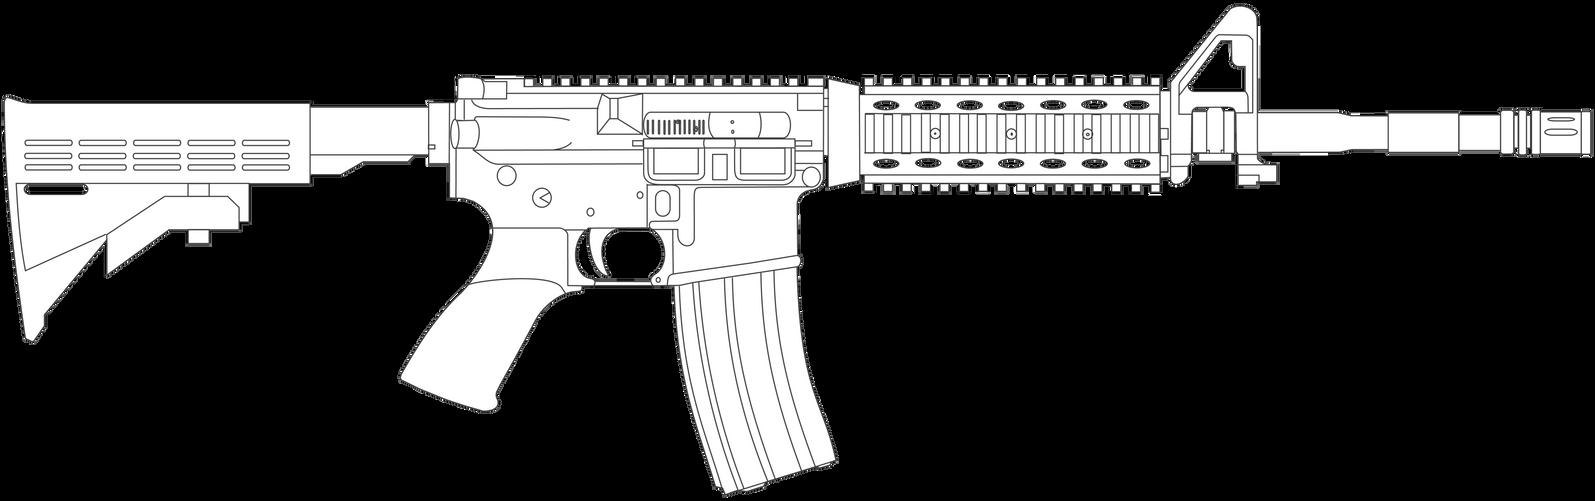 Colt M4a1 Lineart By Spillnerlol On Deviantart